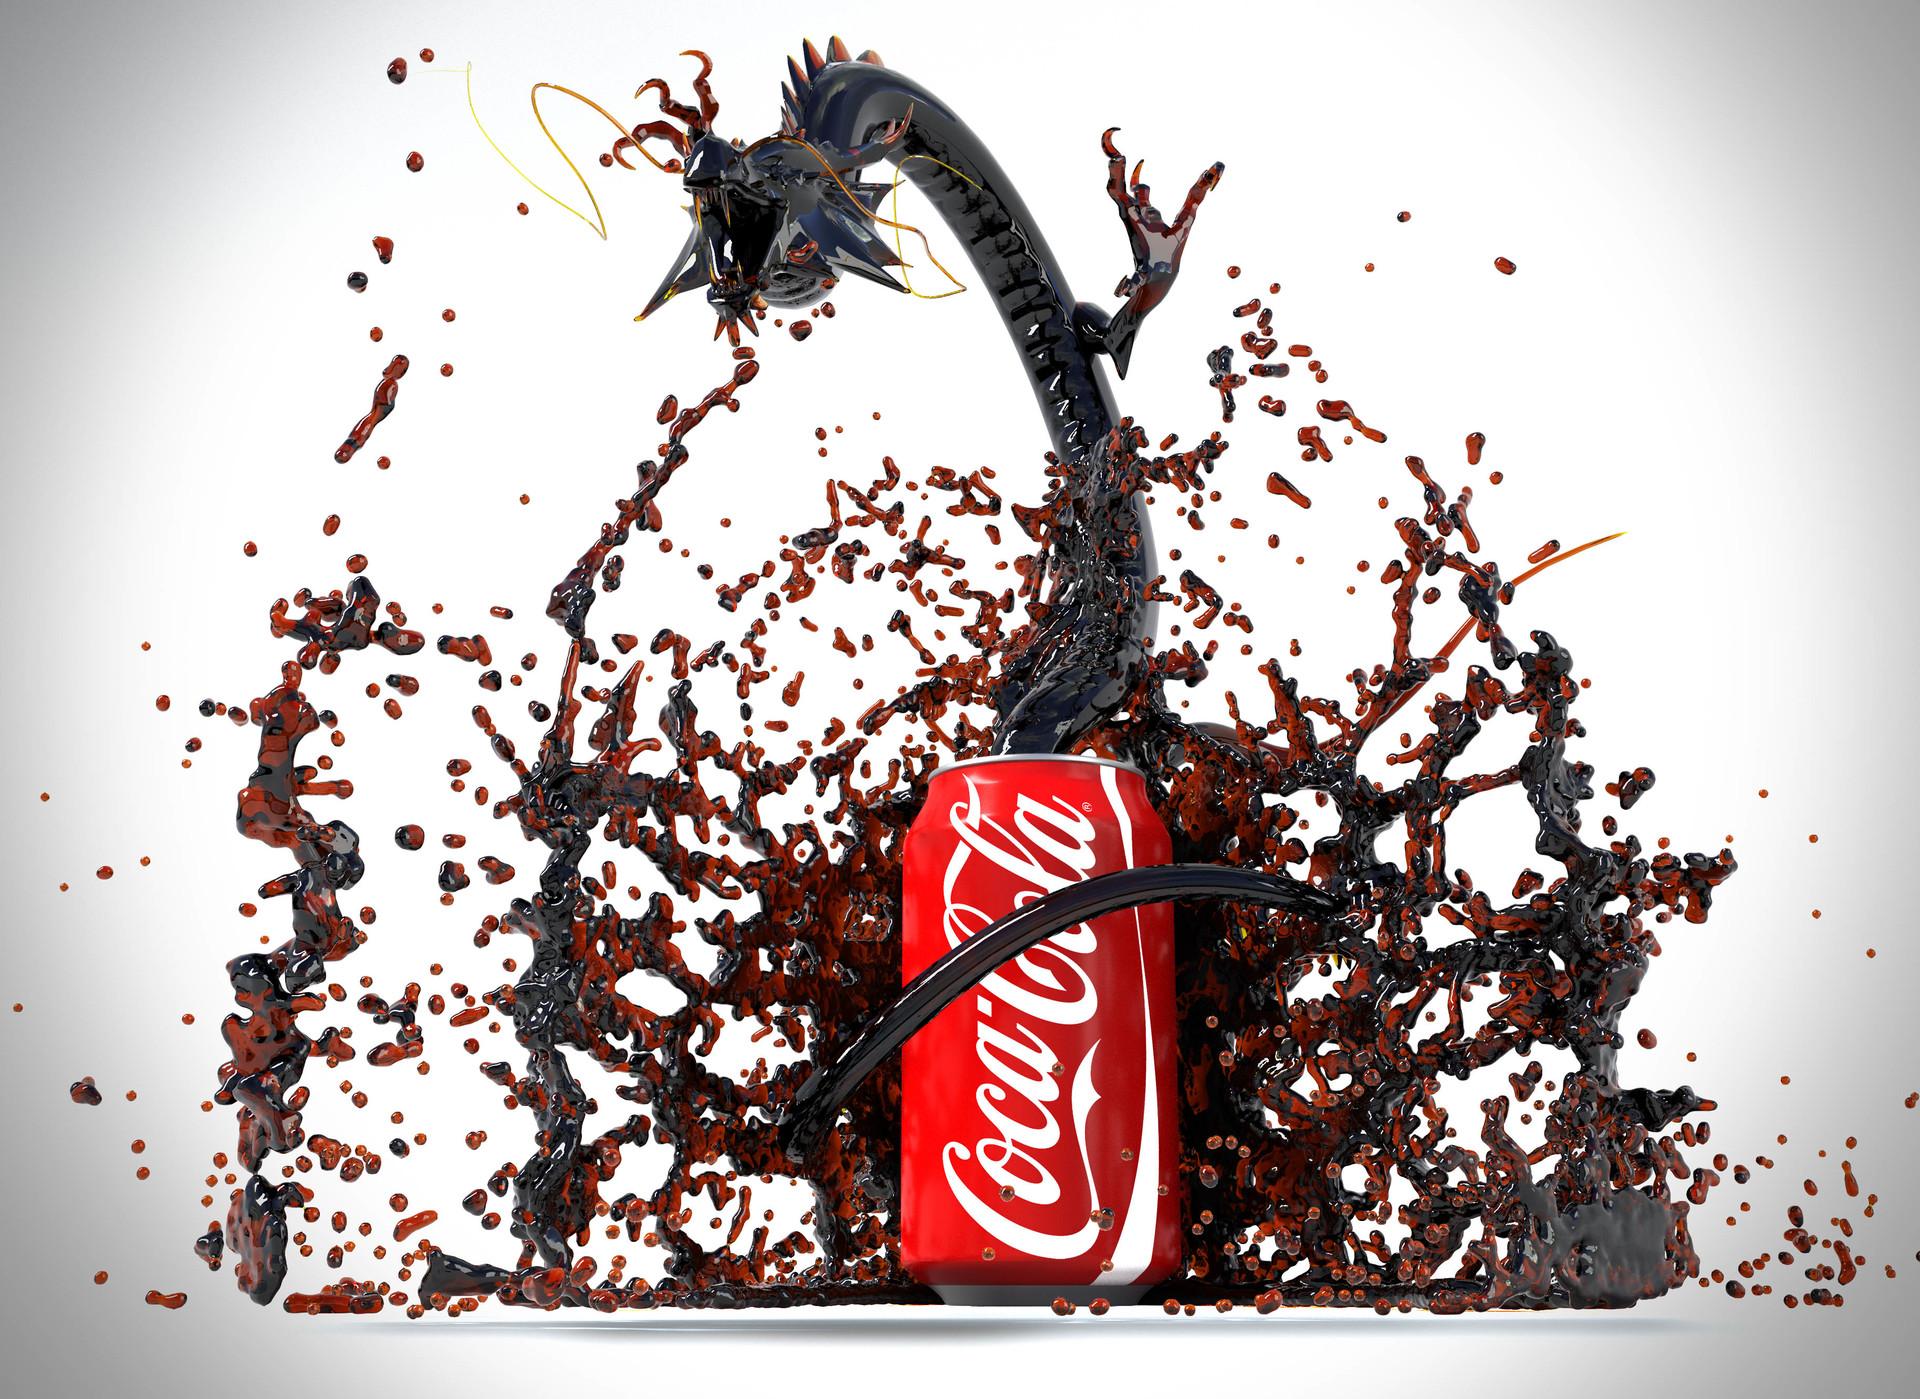 Hugo matilde coca cola color final